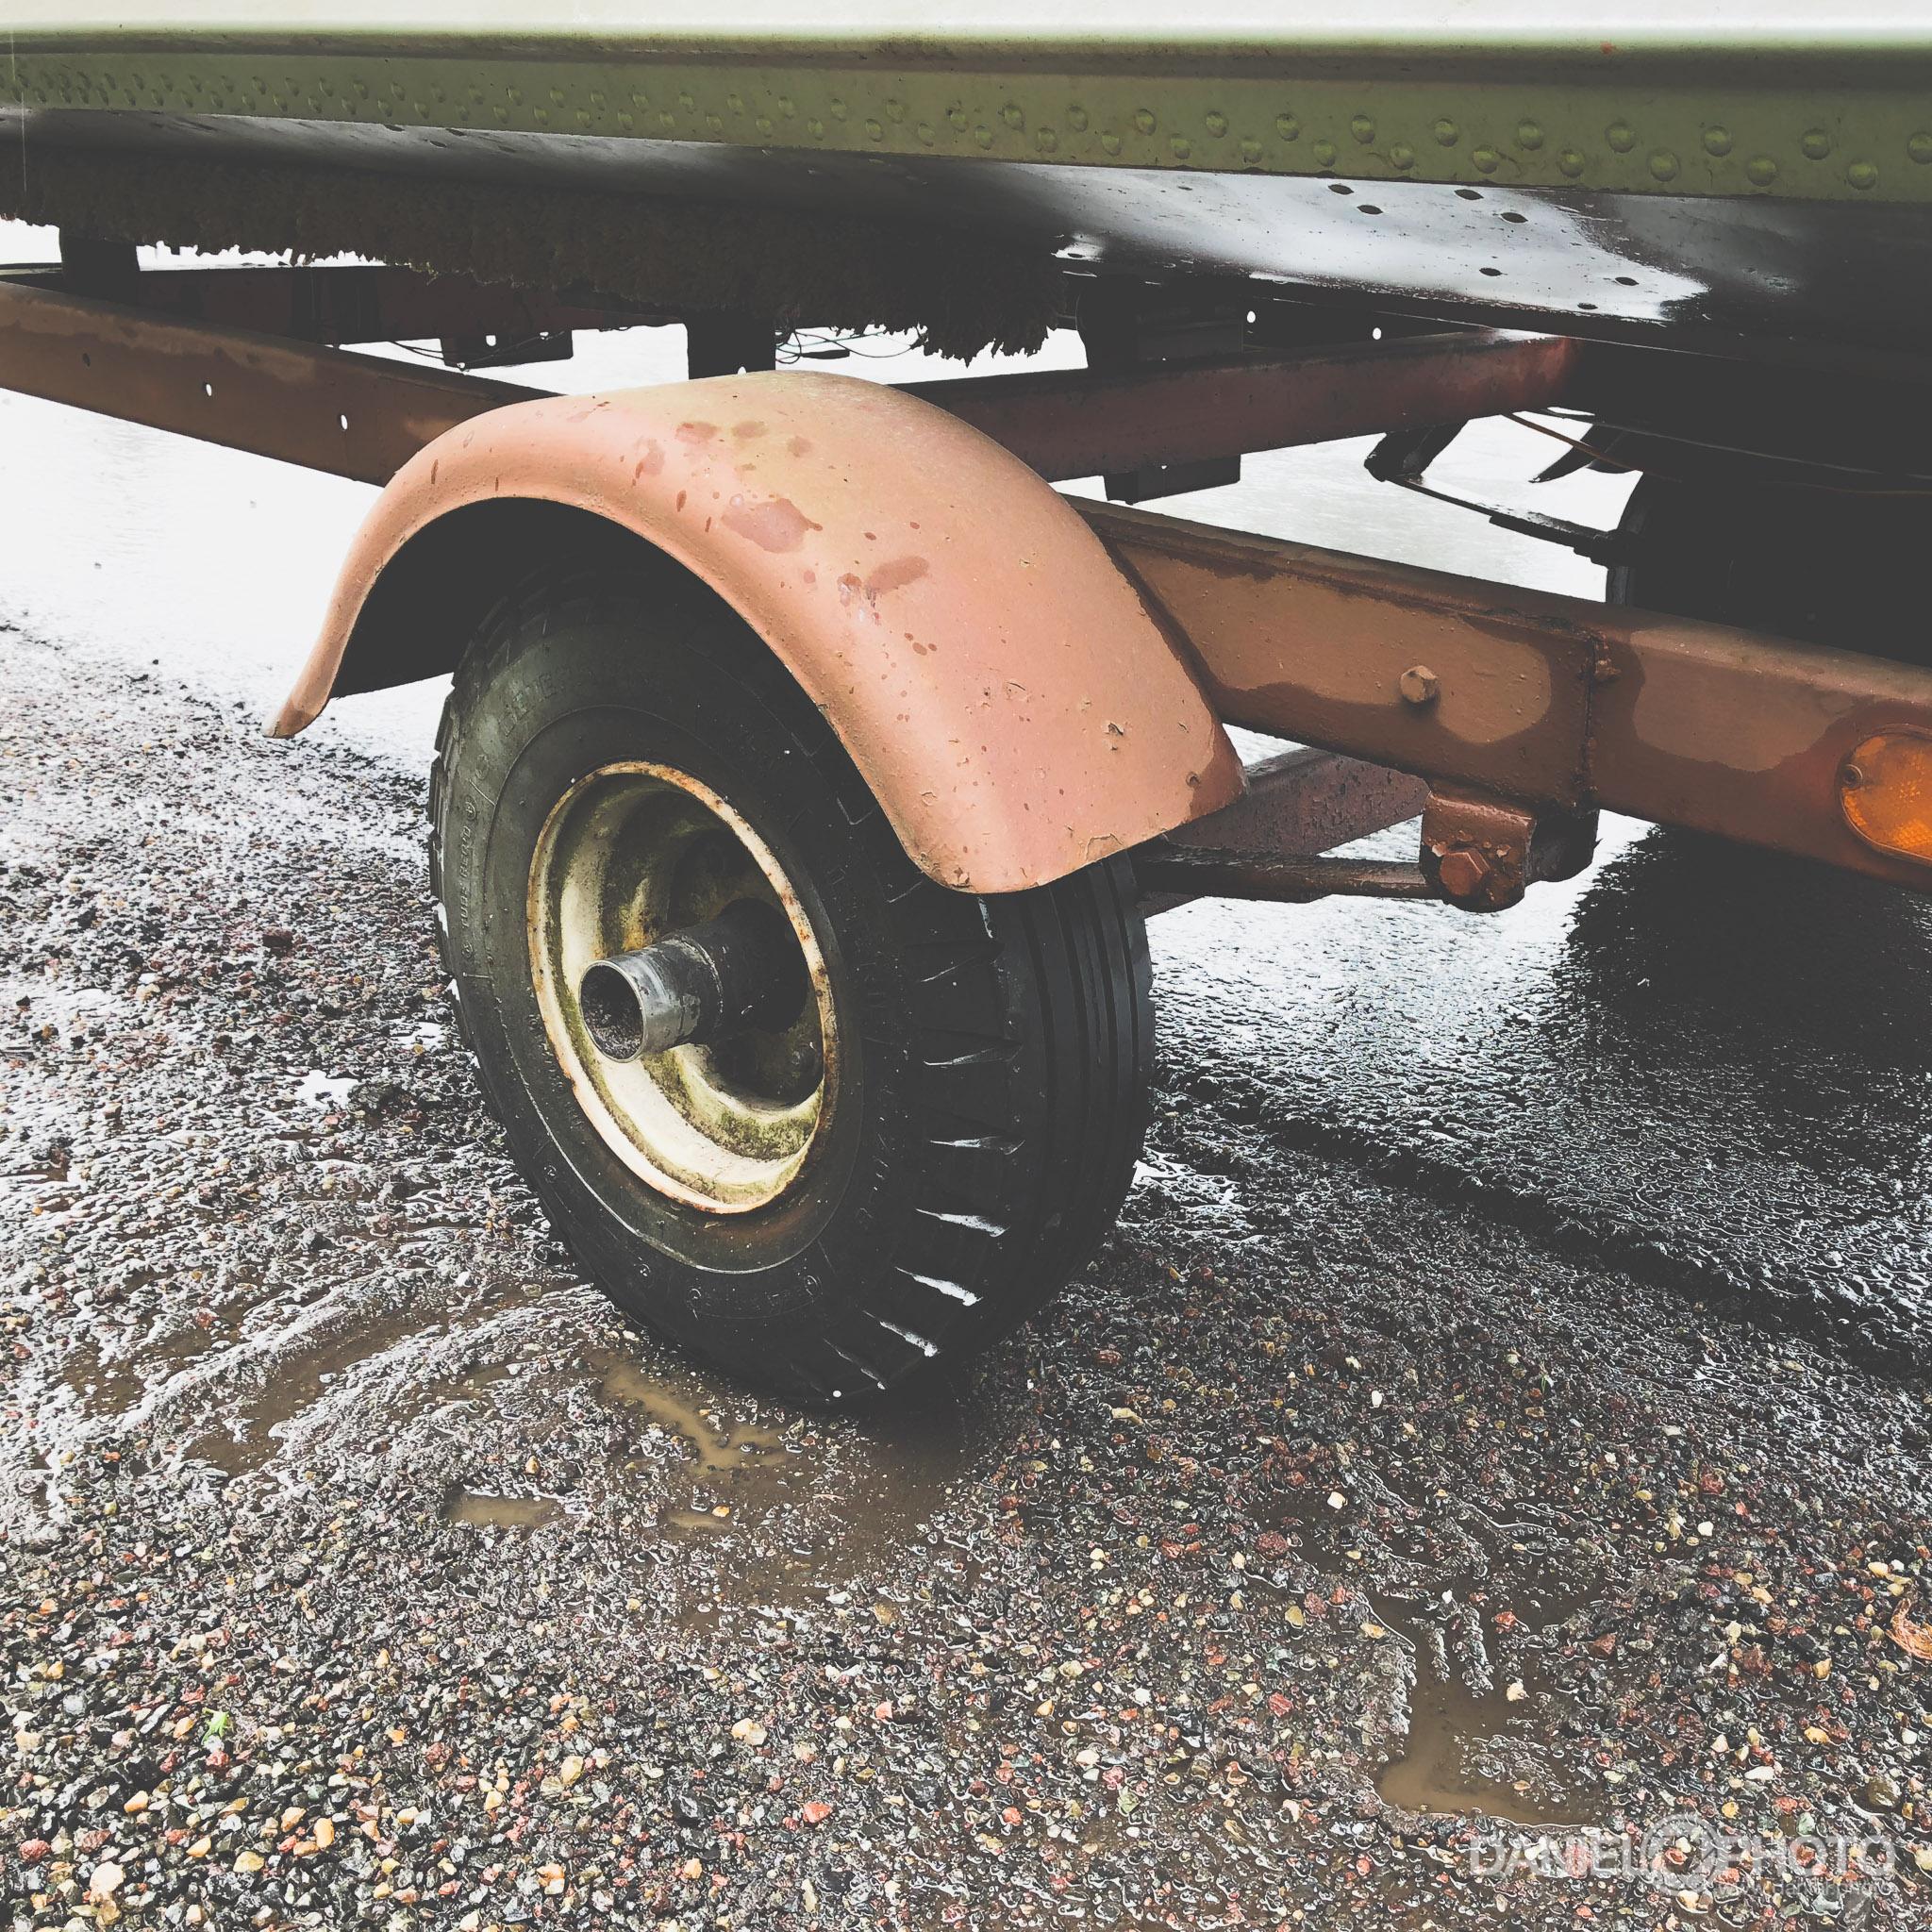 daniel-hedrick-boat-tire-1929.jpg